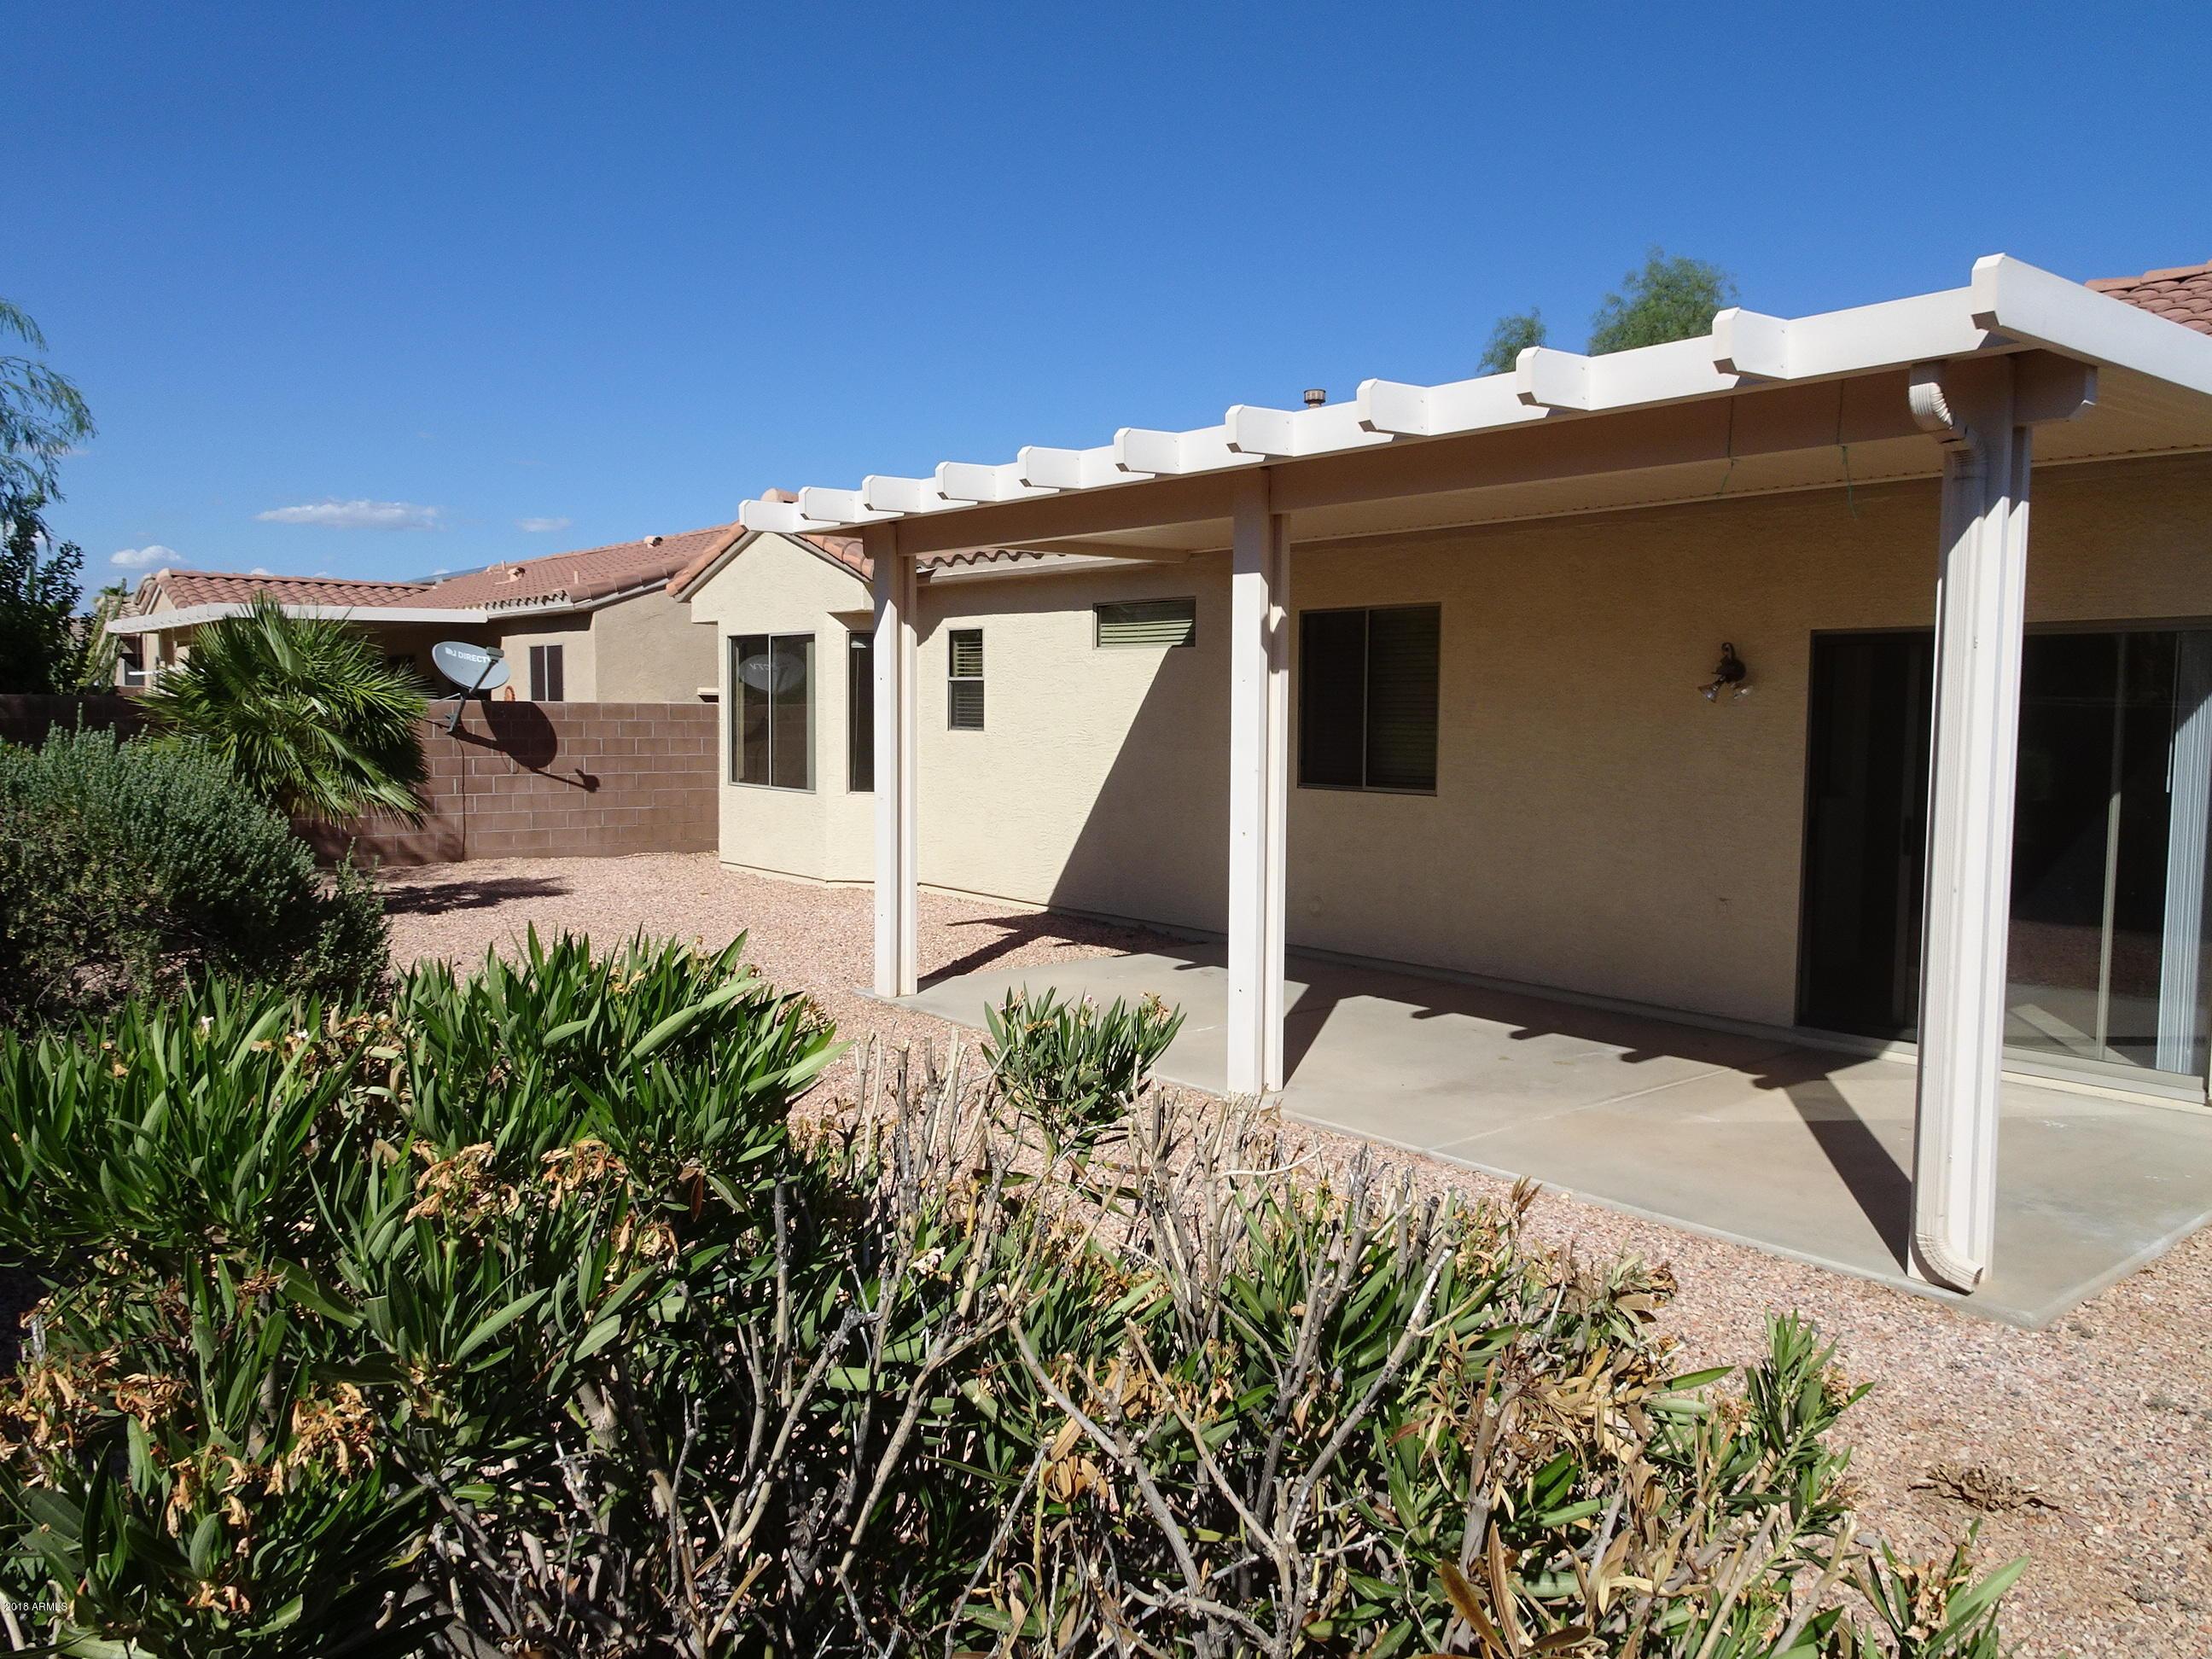 18602 N SALERNO Court Surprise, AZ 85387 - MLS #: 5824906